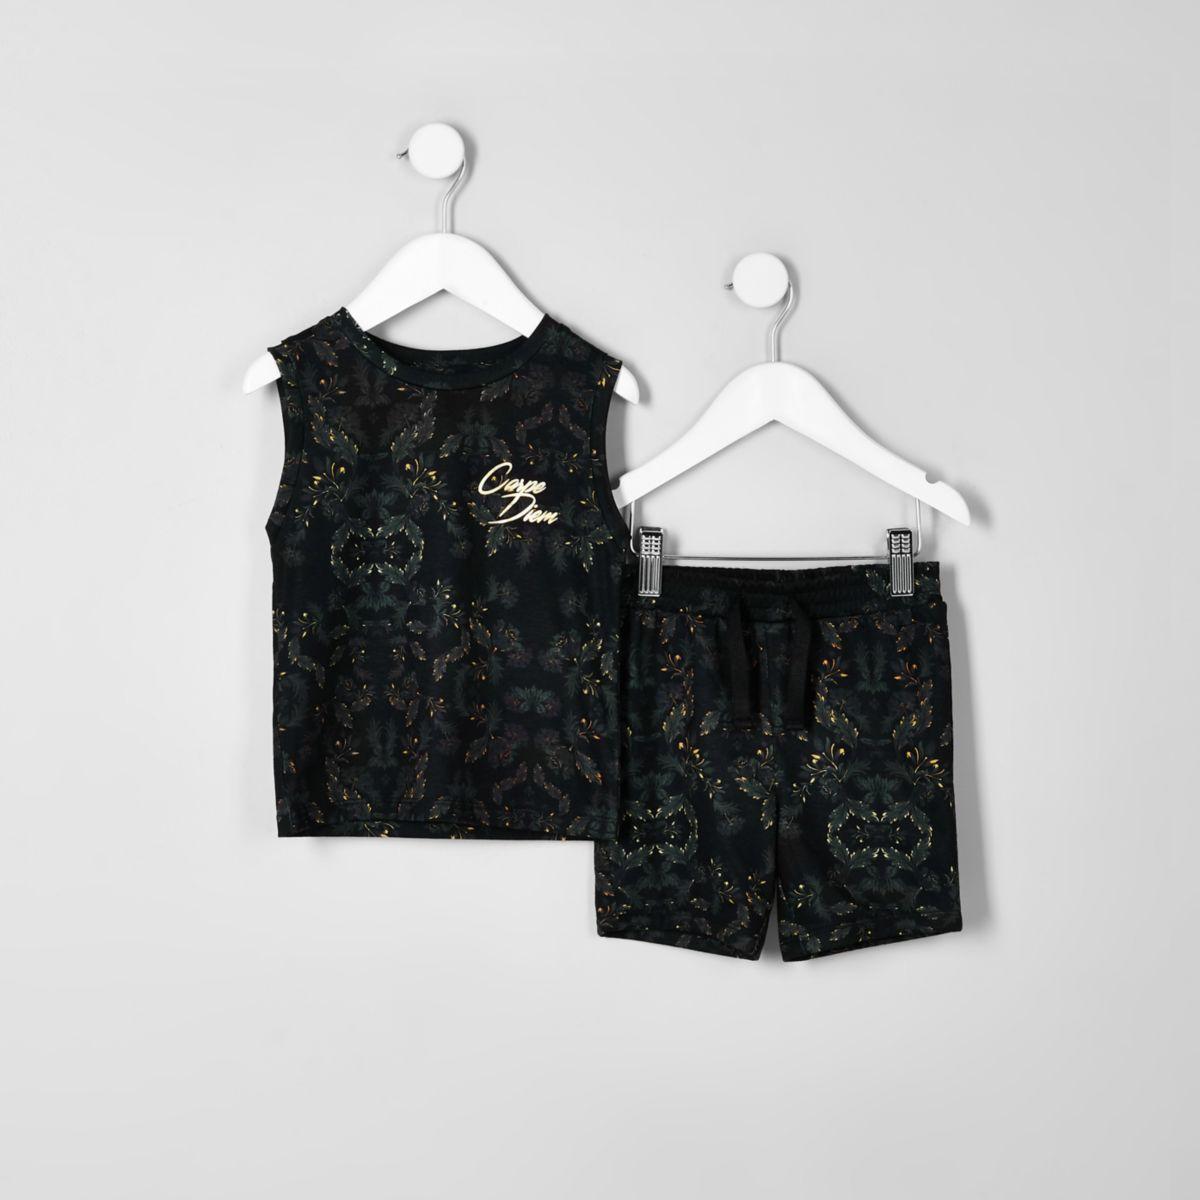 Mini boys khaki 'carpe diem' tank top outfit